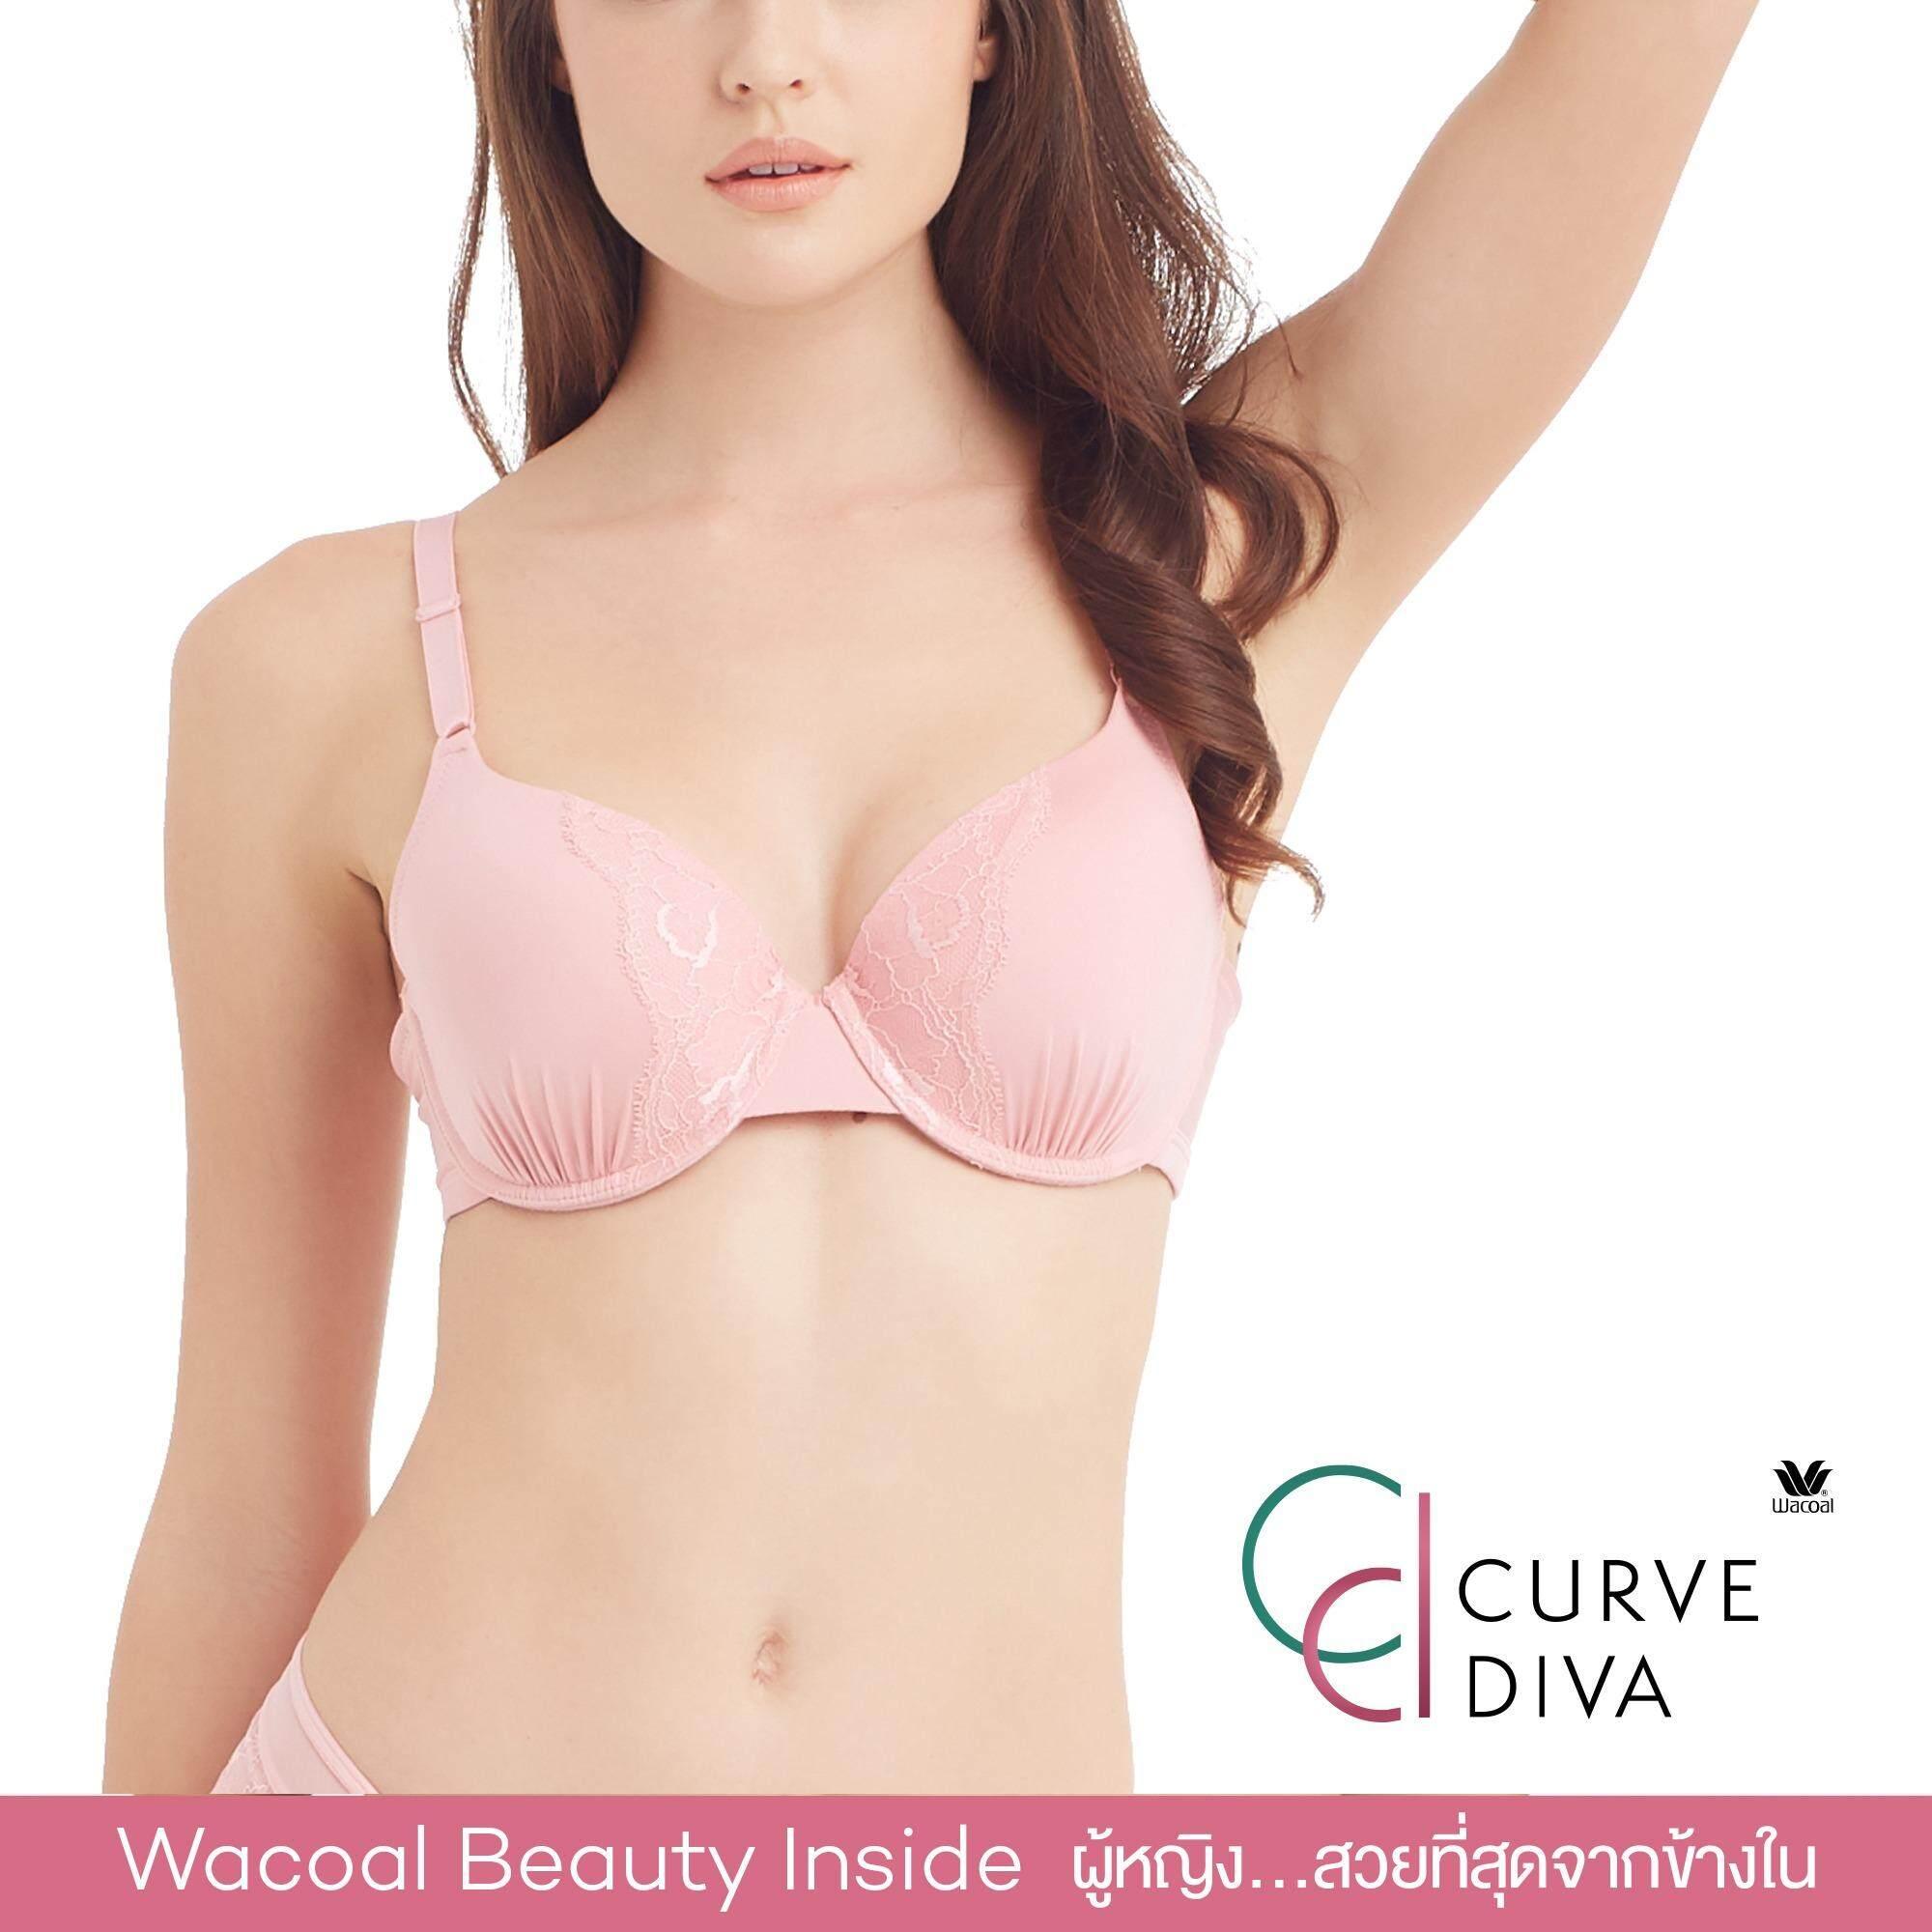 Wacoal Curve Diva Seamless bra 4/5 Cup (สีชมพูกุหลาบป่า/WILD ROSE) - WB7943WR